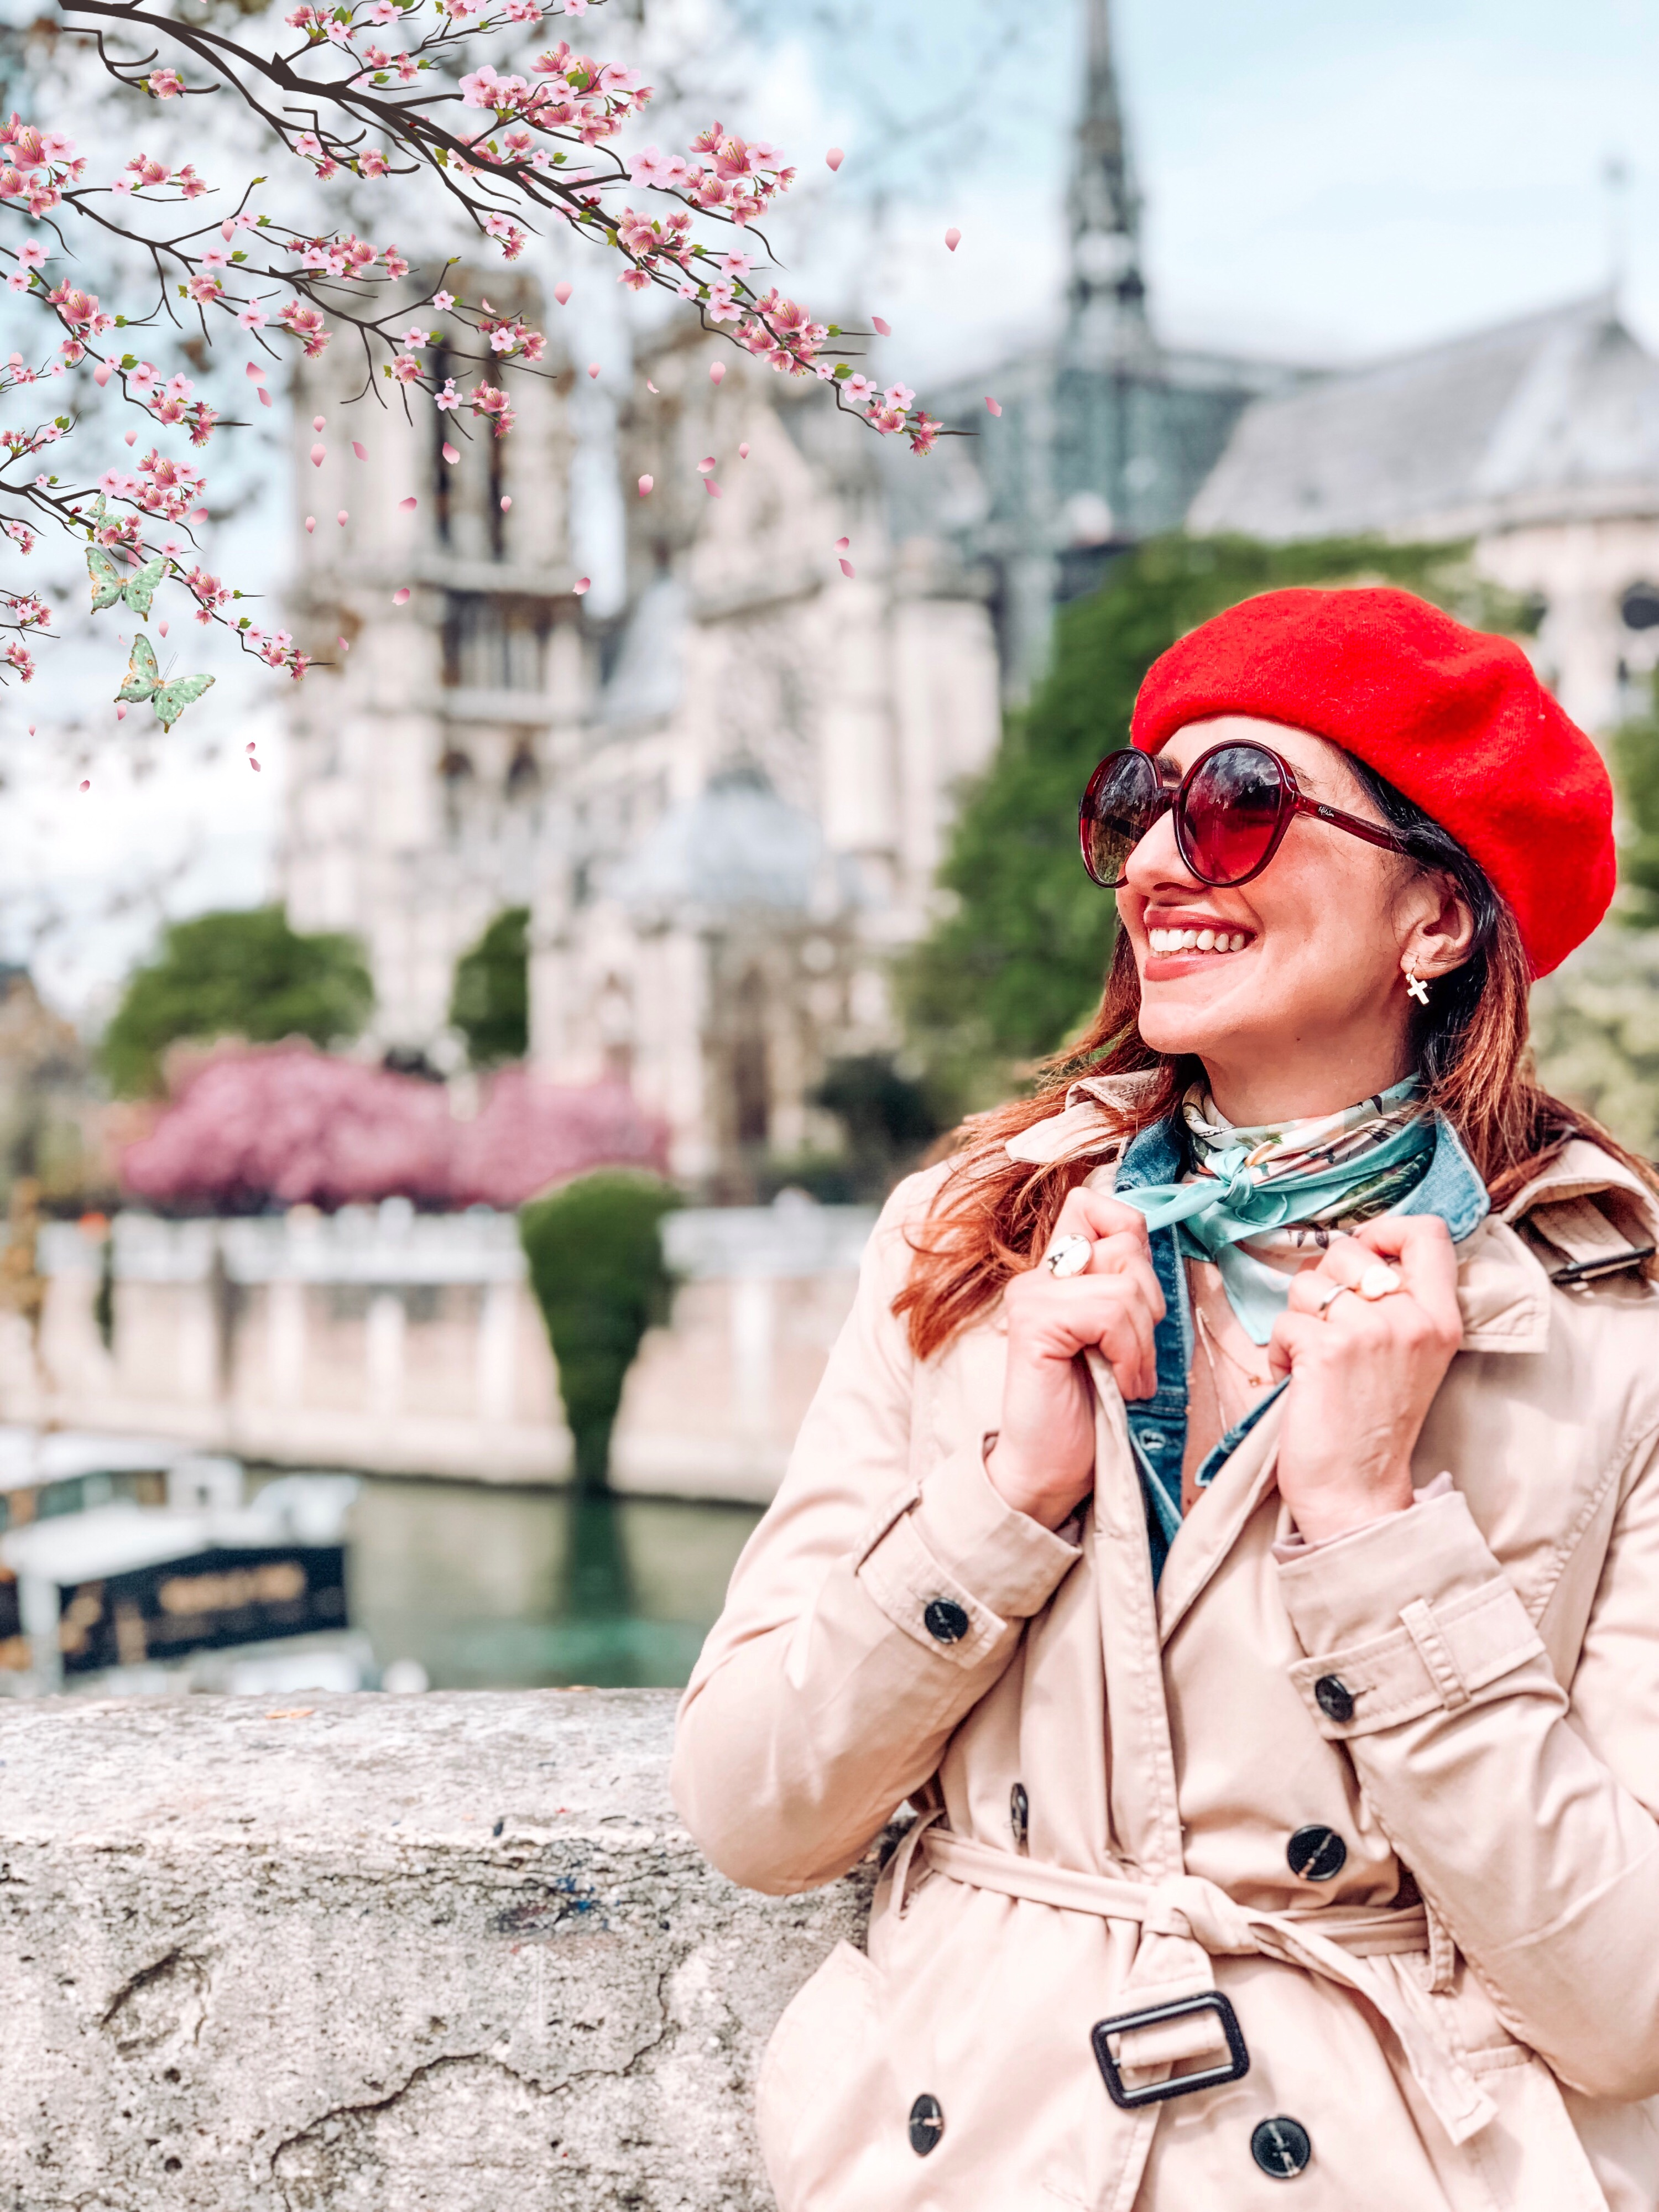 Ponti di Parigi, pont de l'archevêché, Parigi, Paris, Paris vacation, tourism in Paris, Paris Travel, balade a Paris, guida di Parigi, paris guide